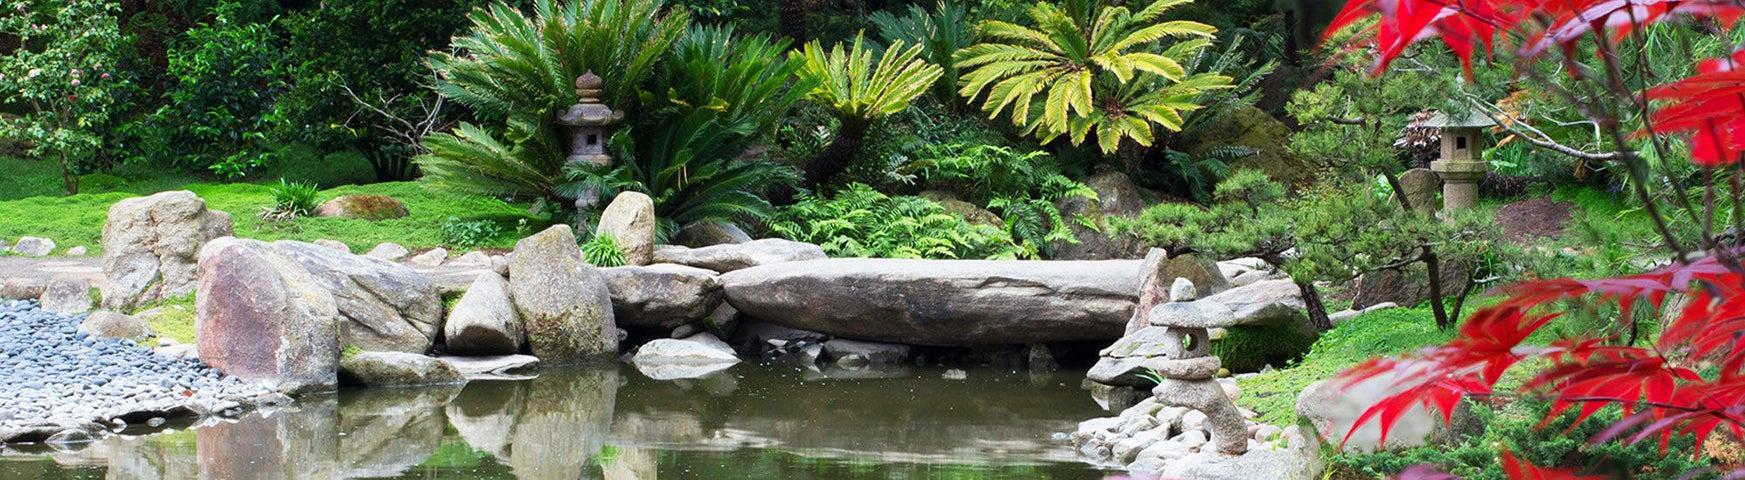 Nearby: Lotusland Japanese Garden